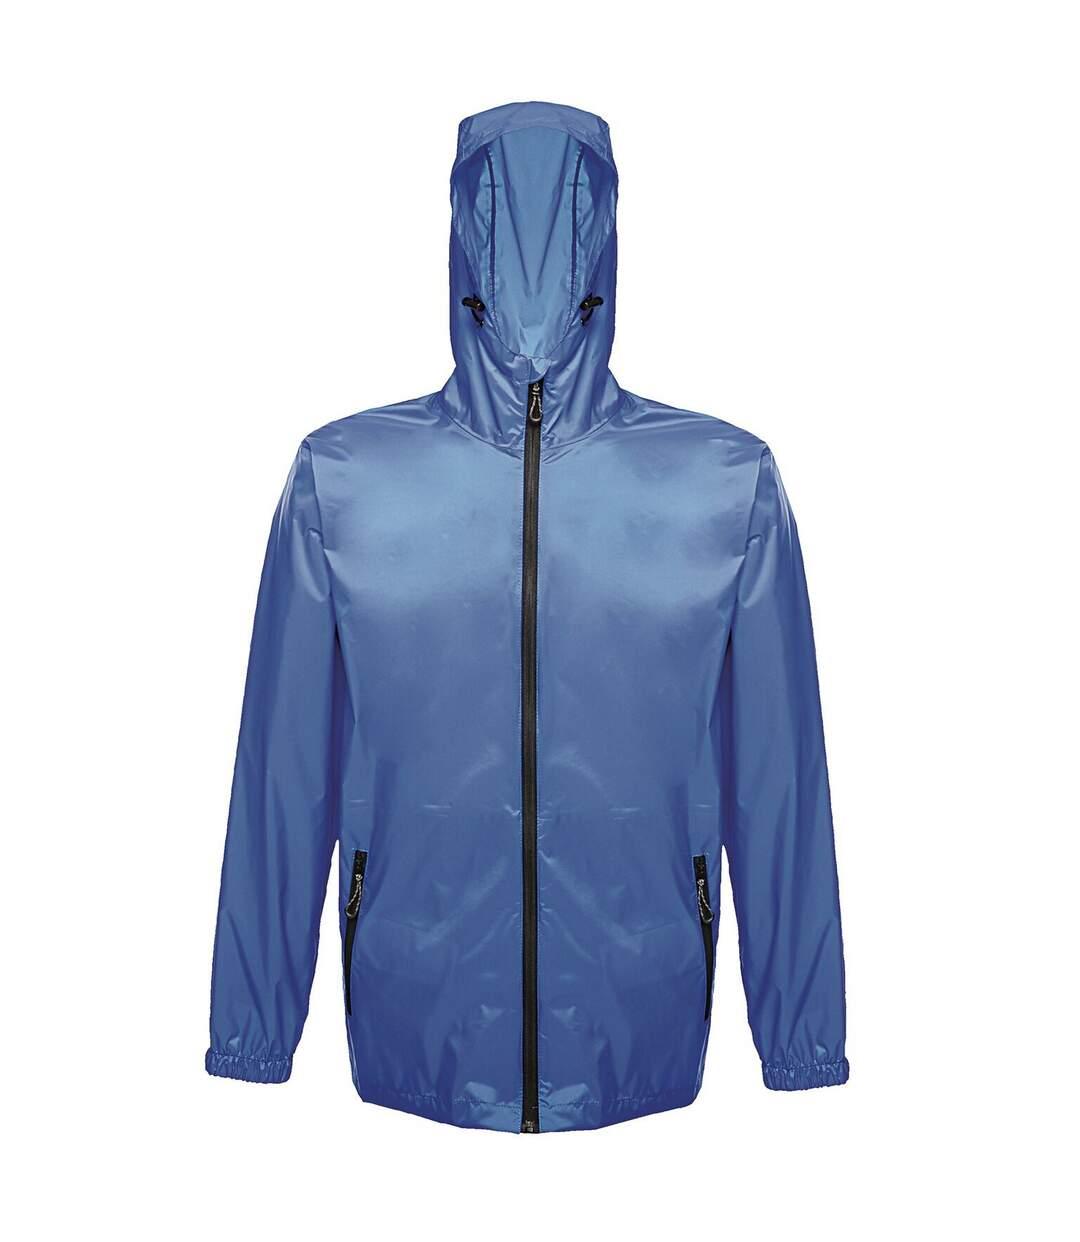 Regatta Pro Mens Packaway Waterproof Breathable Jacket (Oxford Blue) - UTPC2994